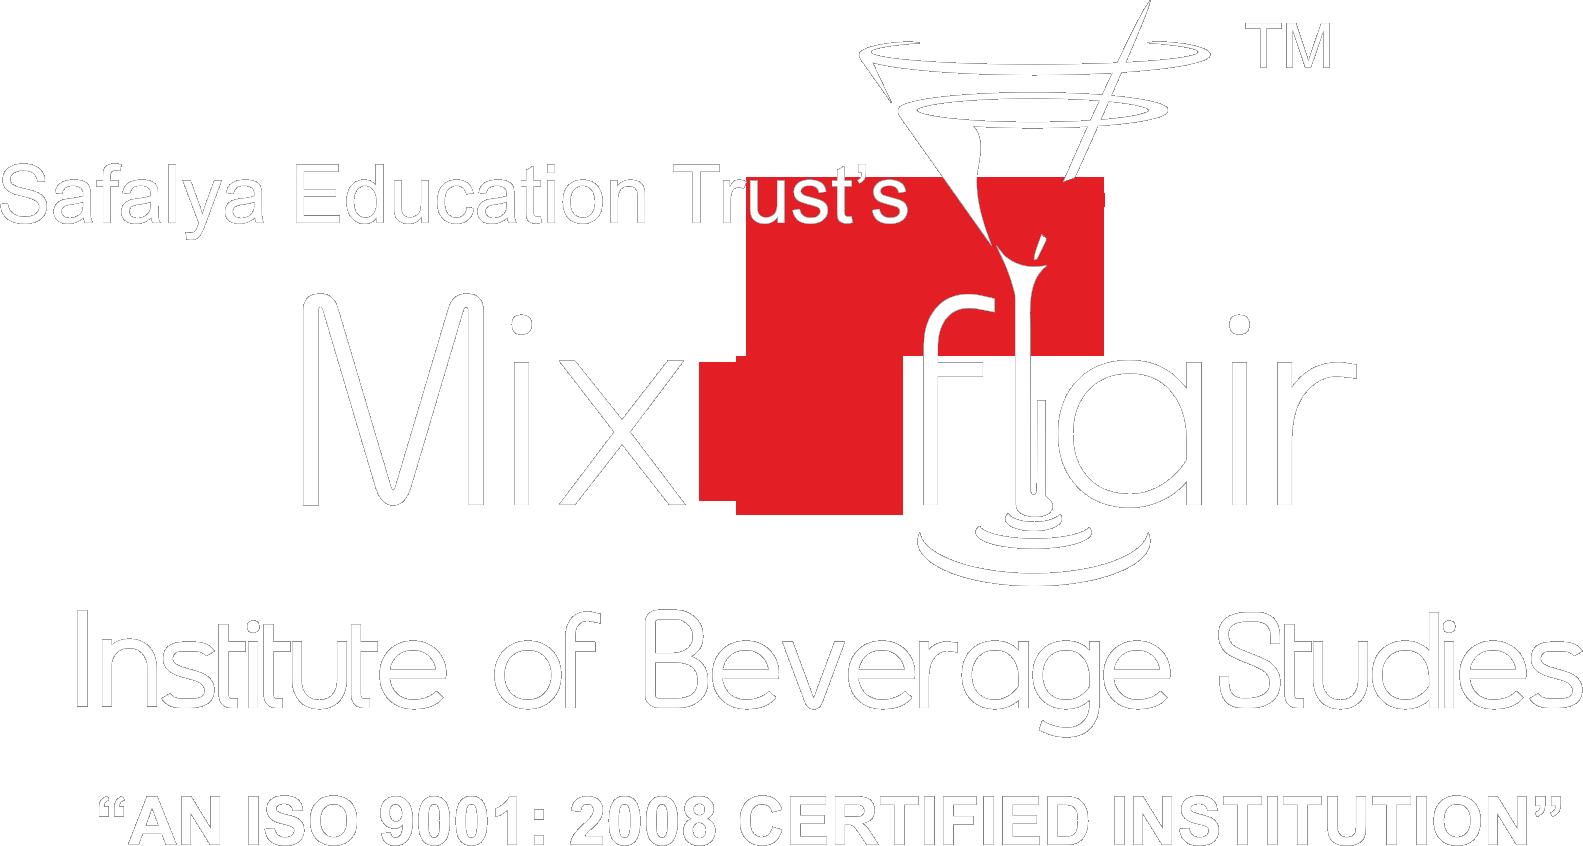 Mixoflair Institute of Beverage Studies